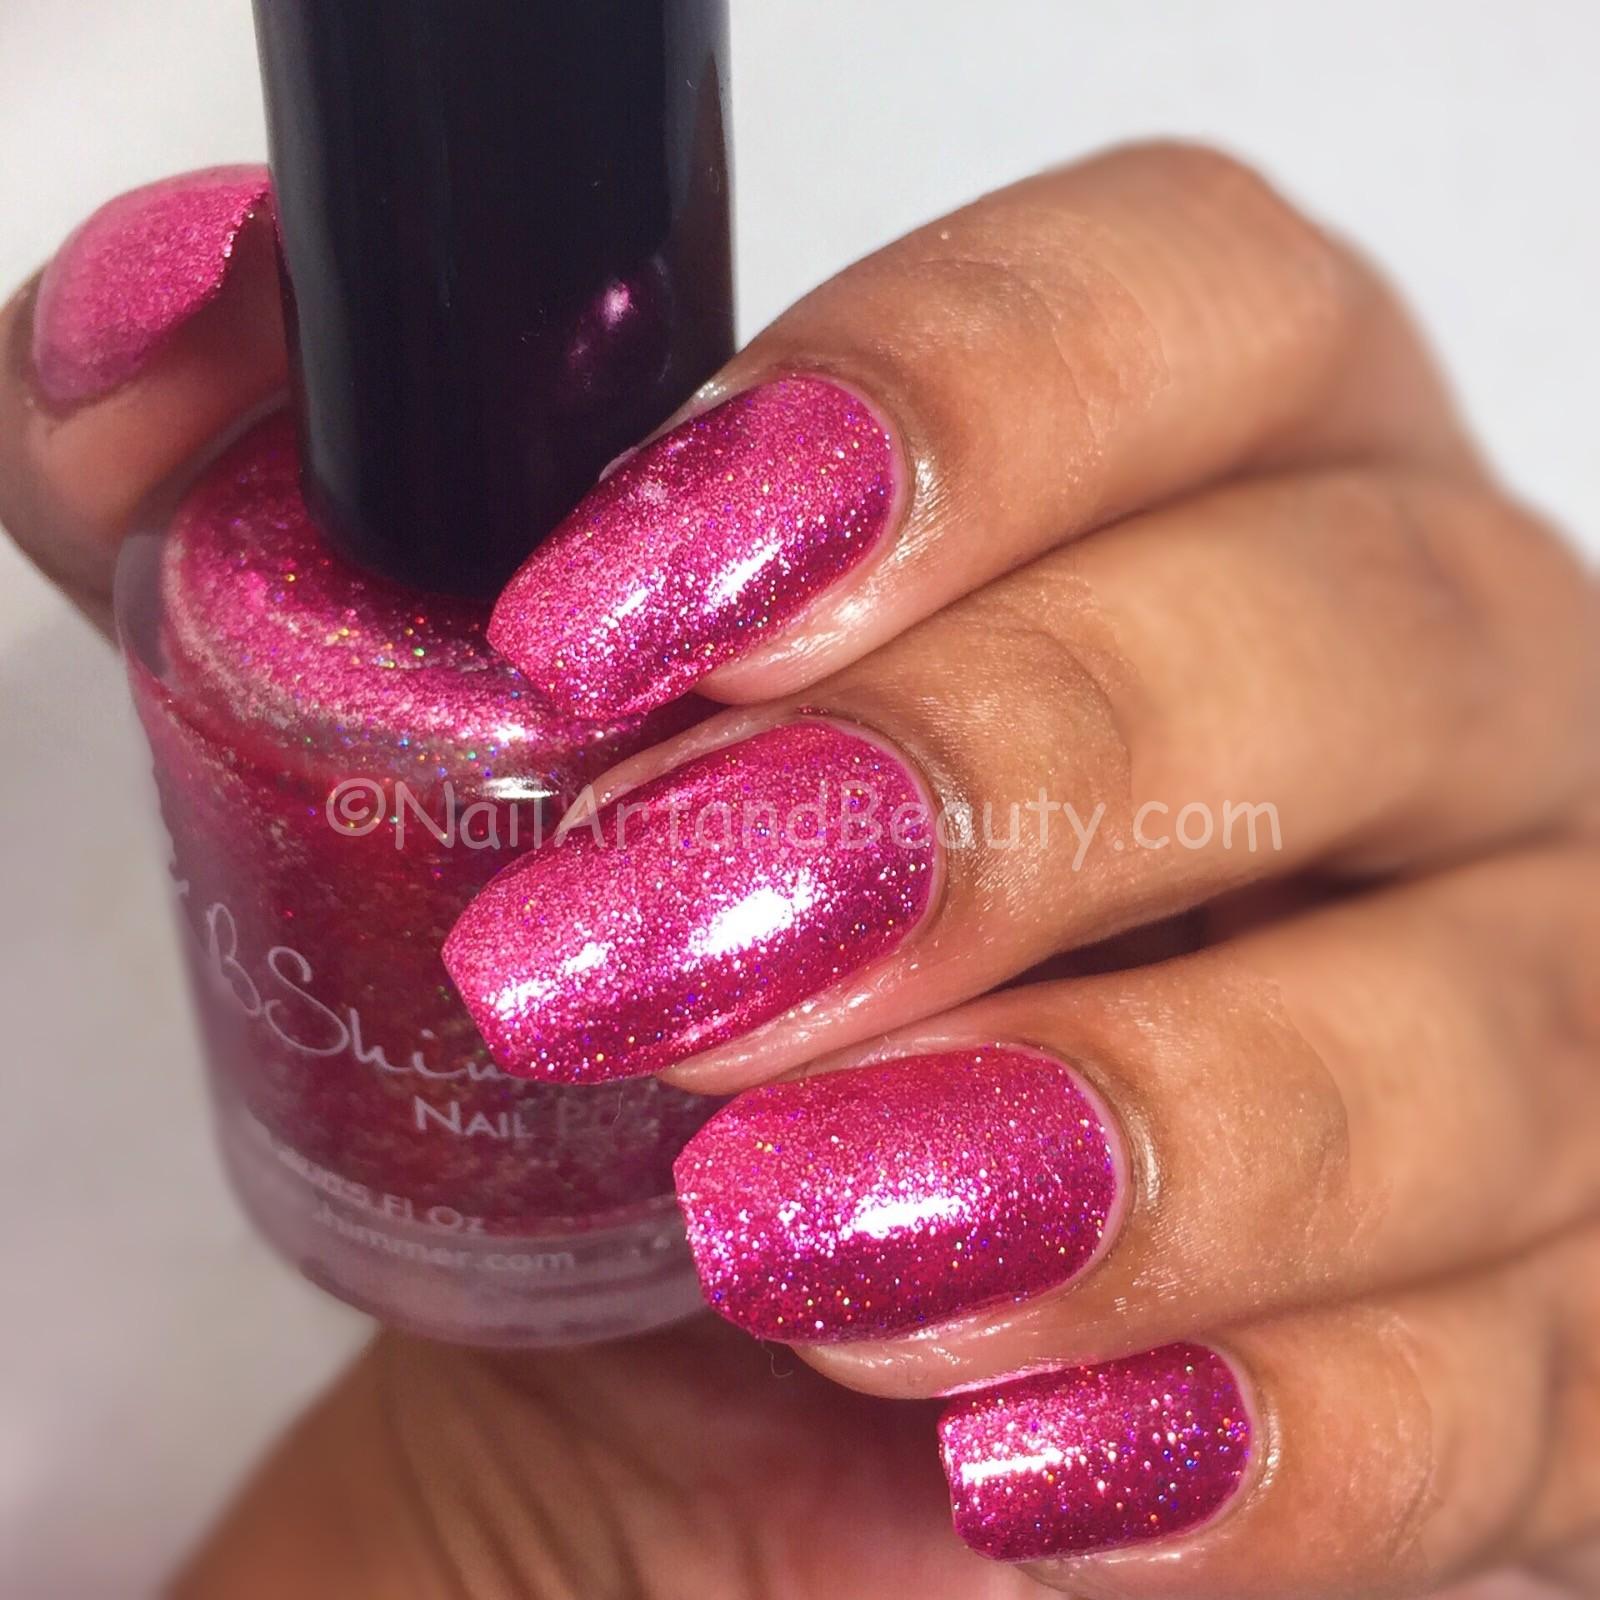 KB Shimmer Pink Tourmaline Swatch